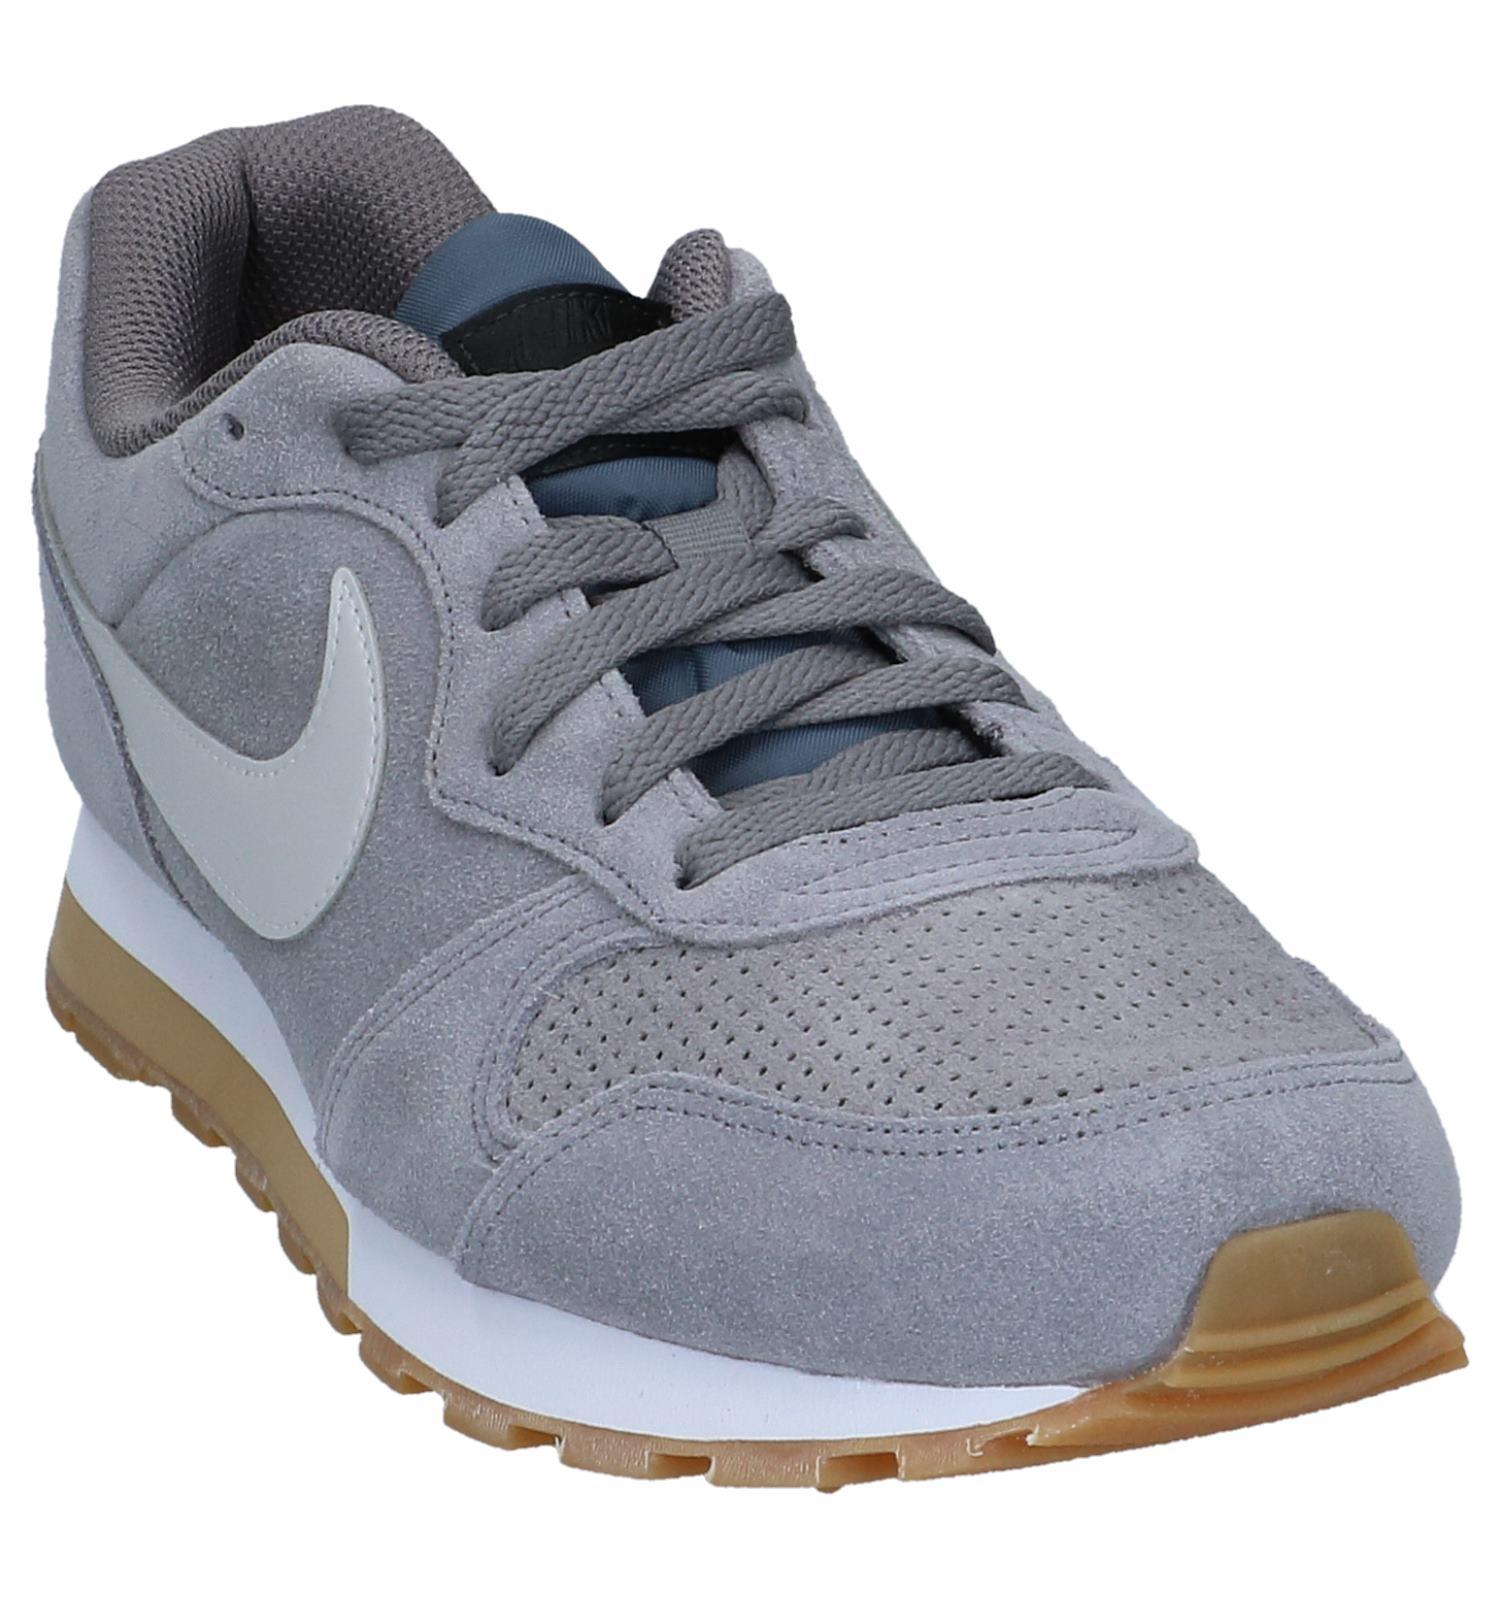 1fddd65ffe5 Grijze Sneakers Nike MD Runner 2 Suede | TORFS.BE | Gratis verzend en retour